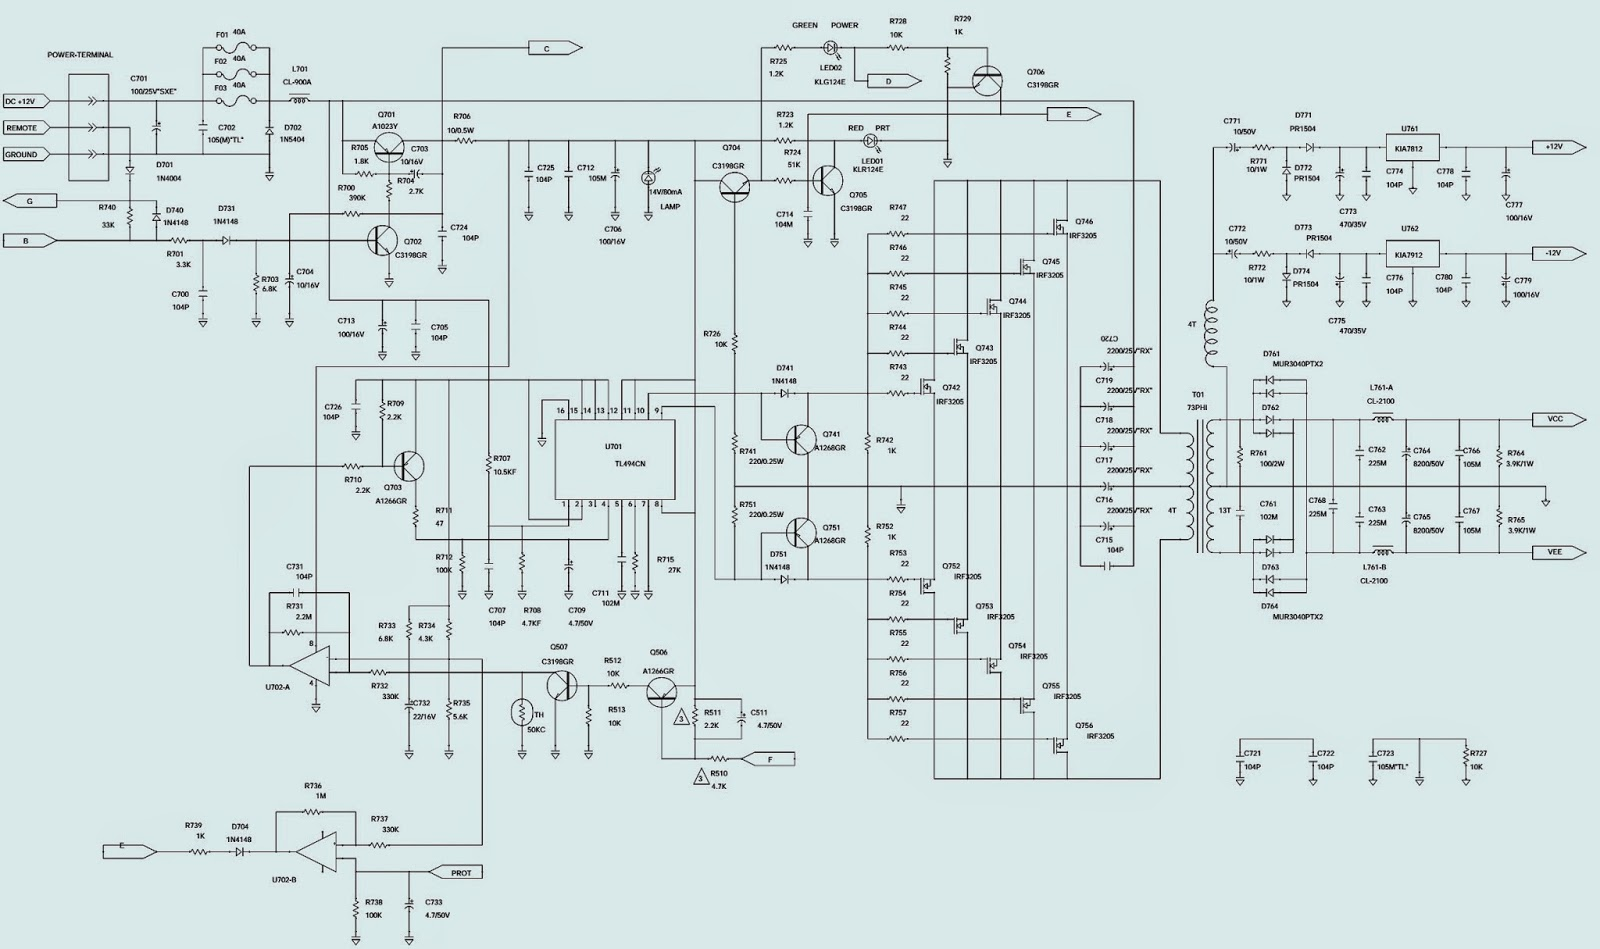 amplifier wiring diagram 2003 dodge grand caravan fuel pump car power schematic get free image about